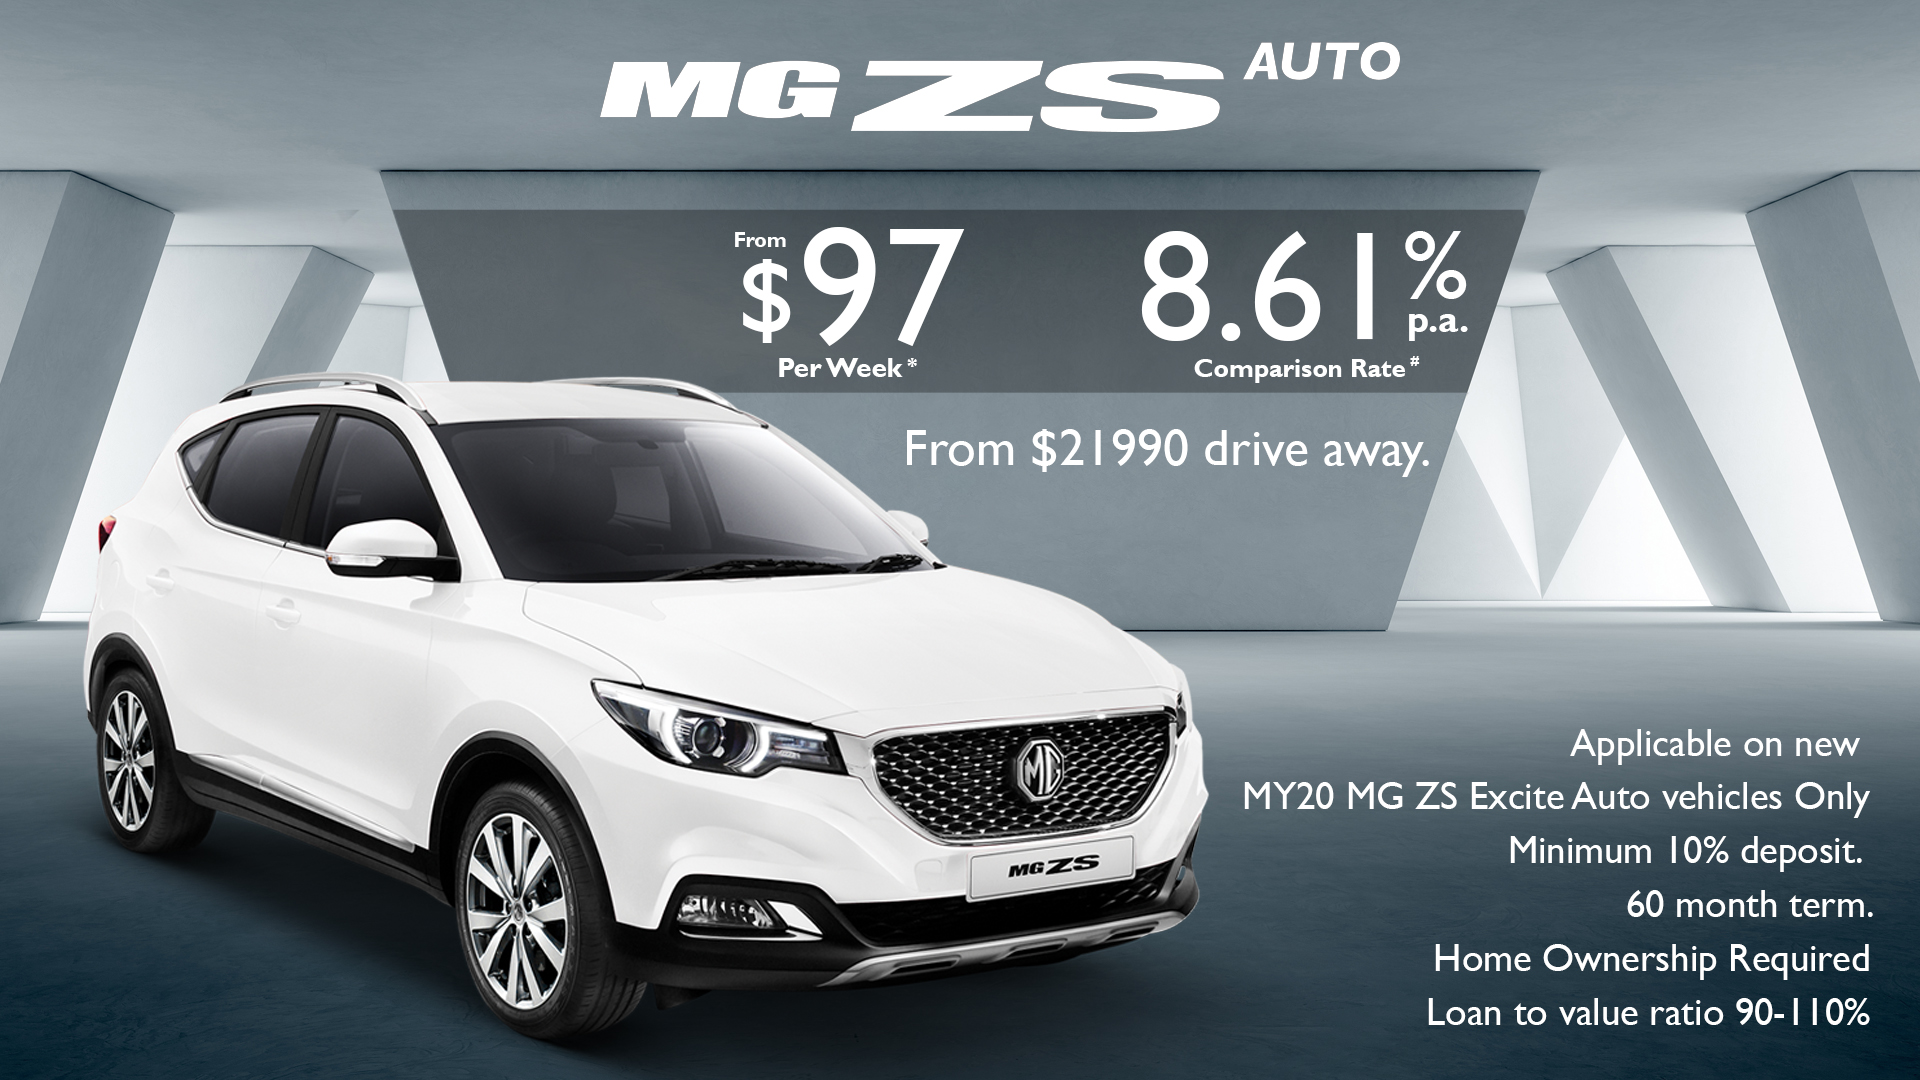 Nova MG ZS Finance Offer